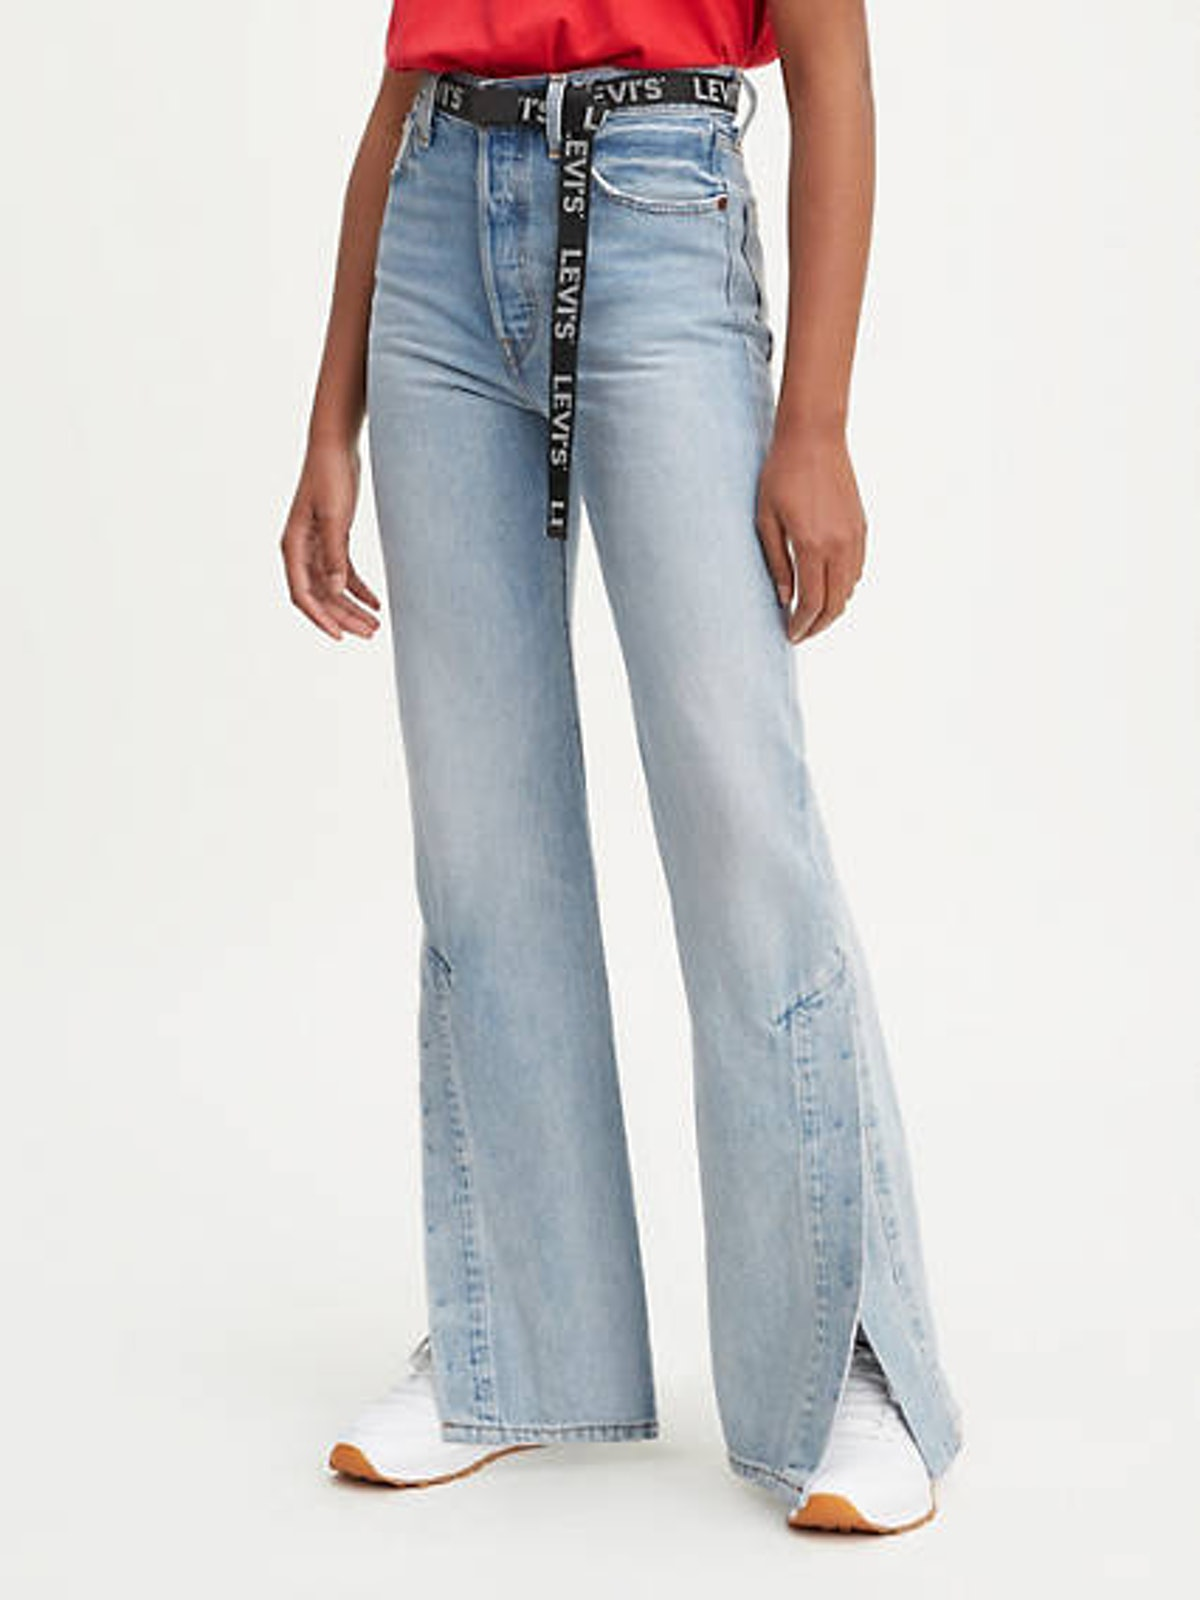 Ribcage Split Flare Jeans in Dazed And Confused